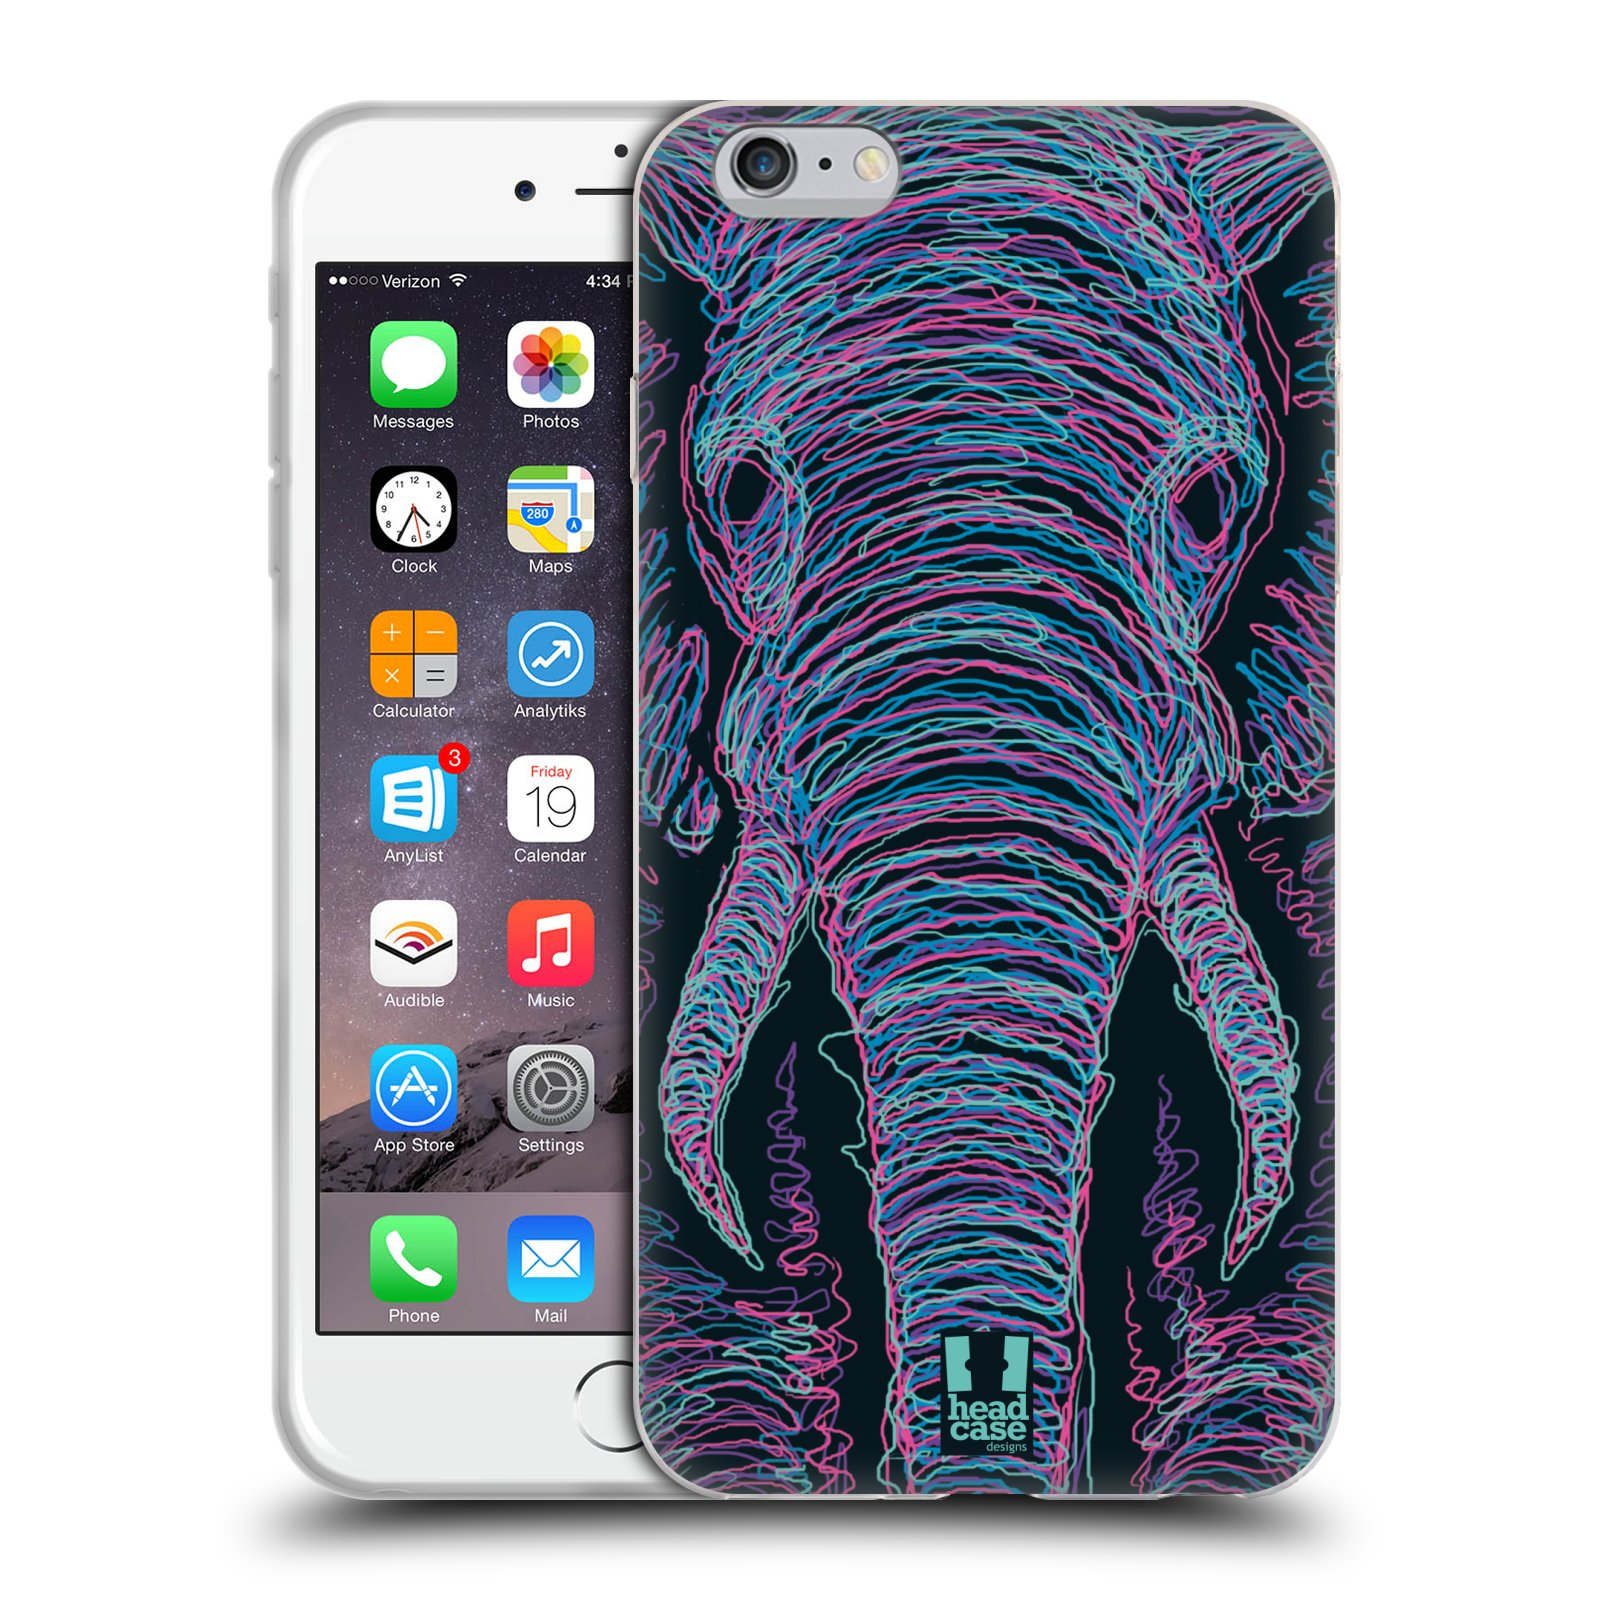 HEAD CASE silikonový obal na mobil Apple Iphone 6 PLUS/ 6S PLUS vzor zvíře čmáranice slon